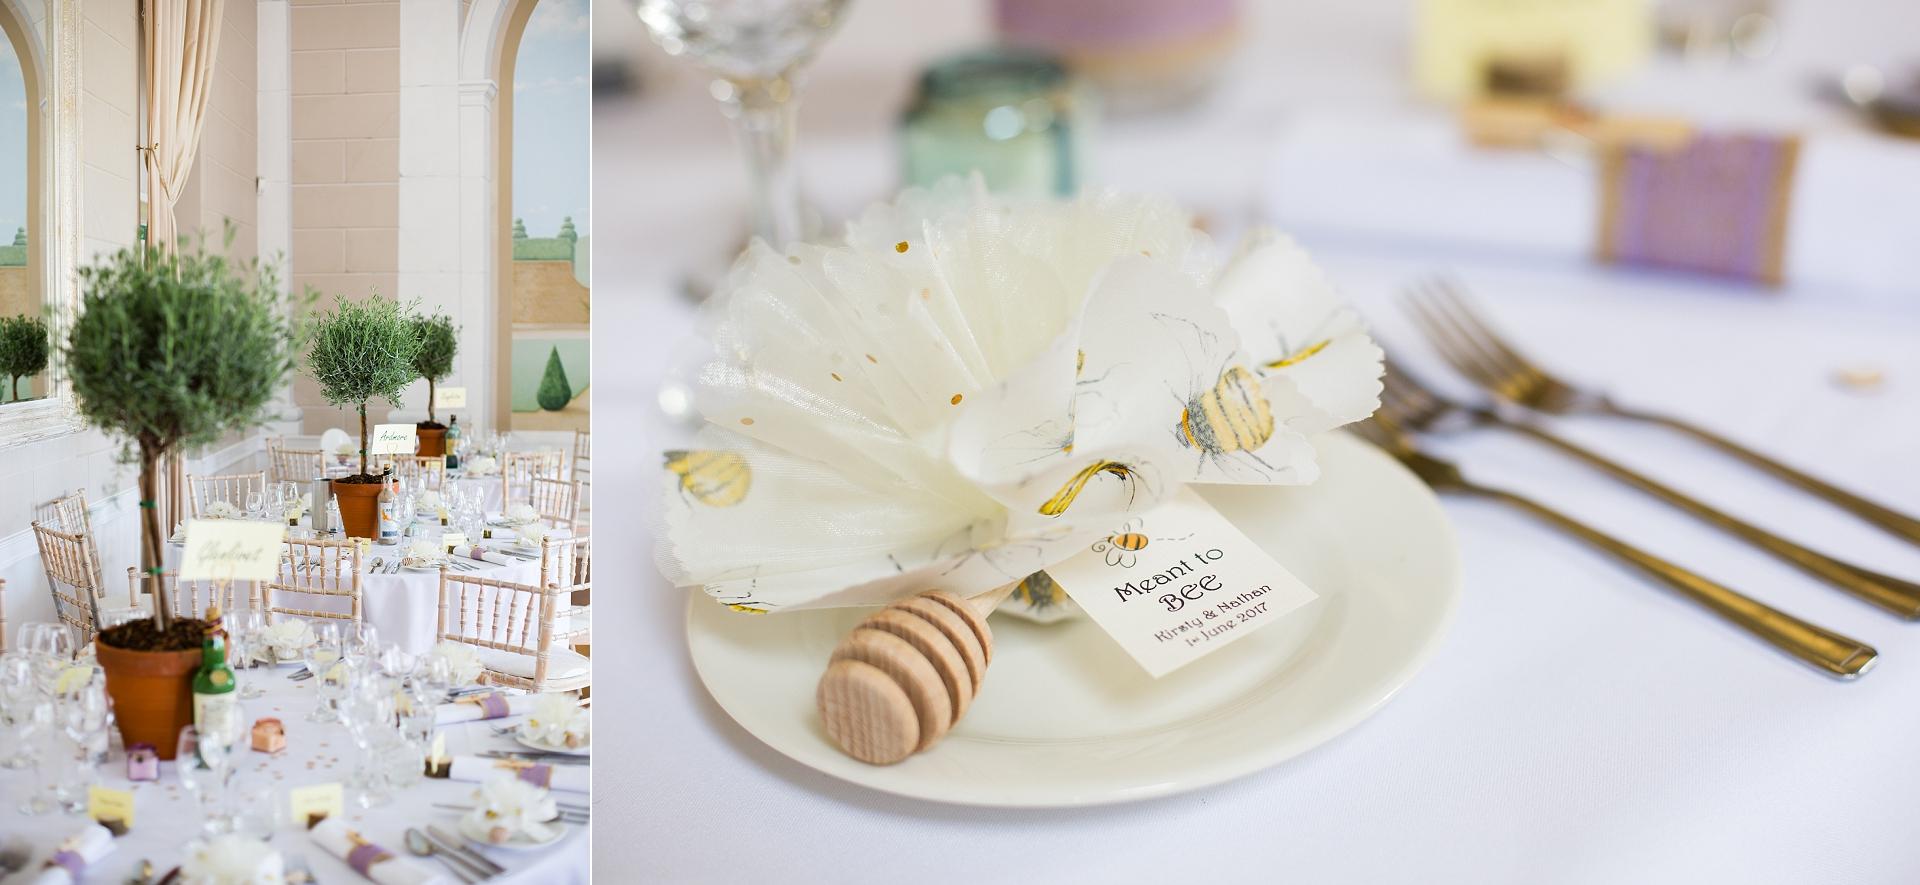 wedding breakfast details